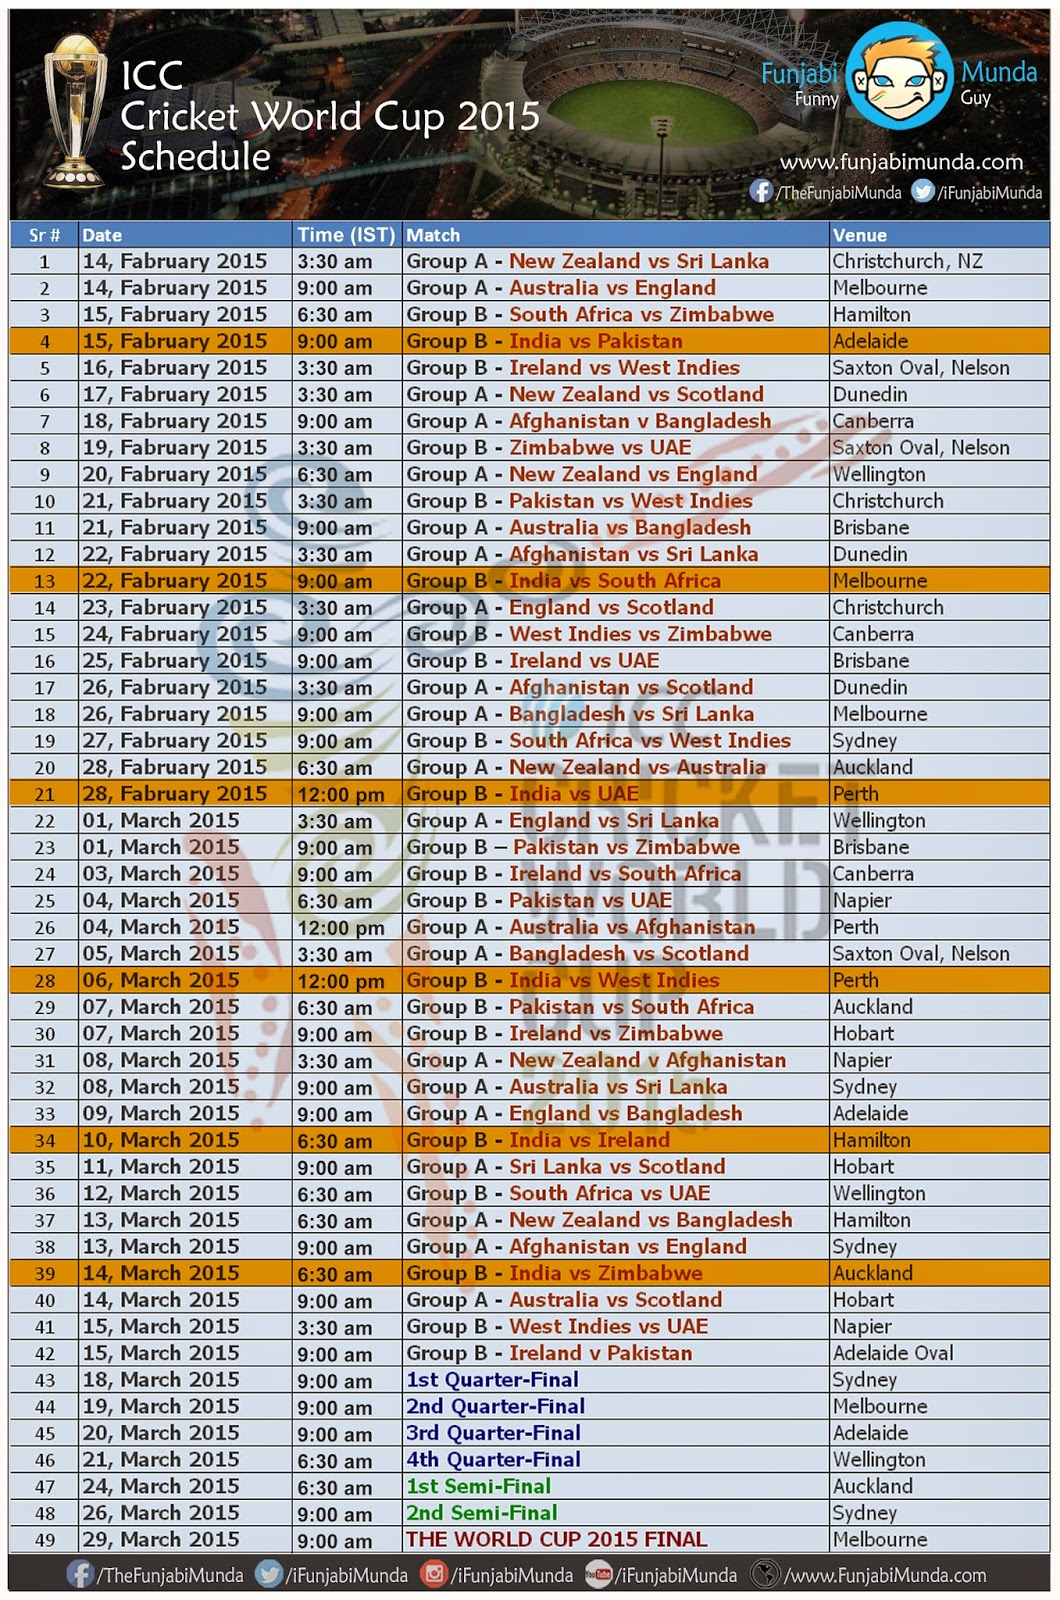 Cricket World Cup 2015 Picher Photo Search Results Calendar